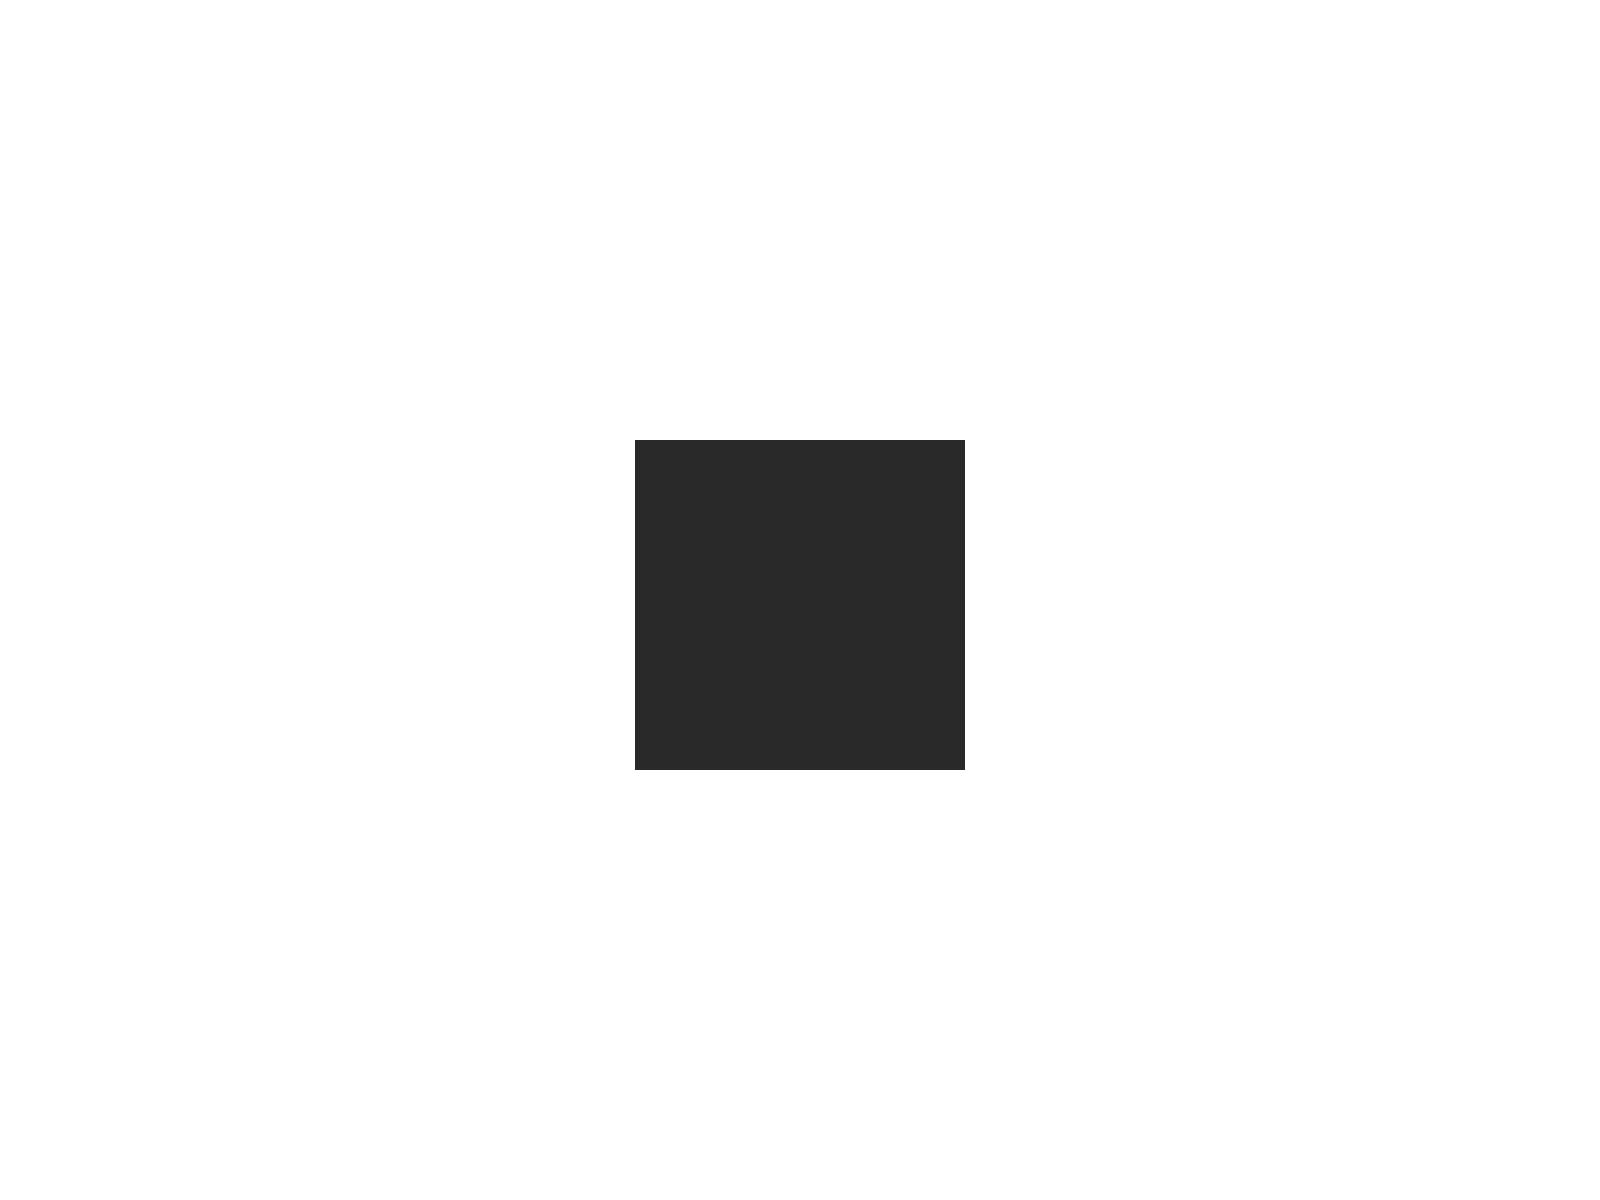 200325_logo_DavidRicketts